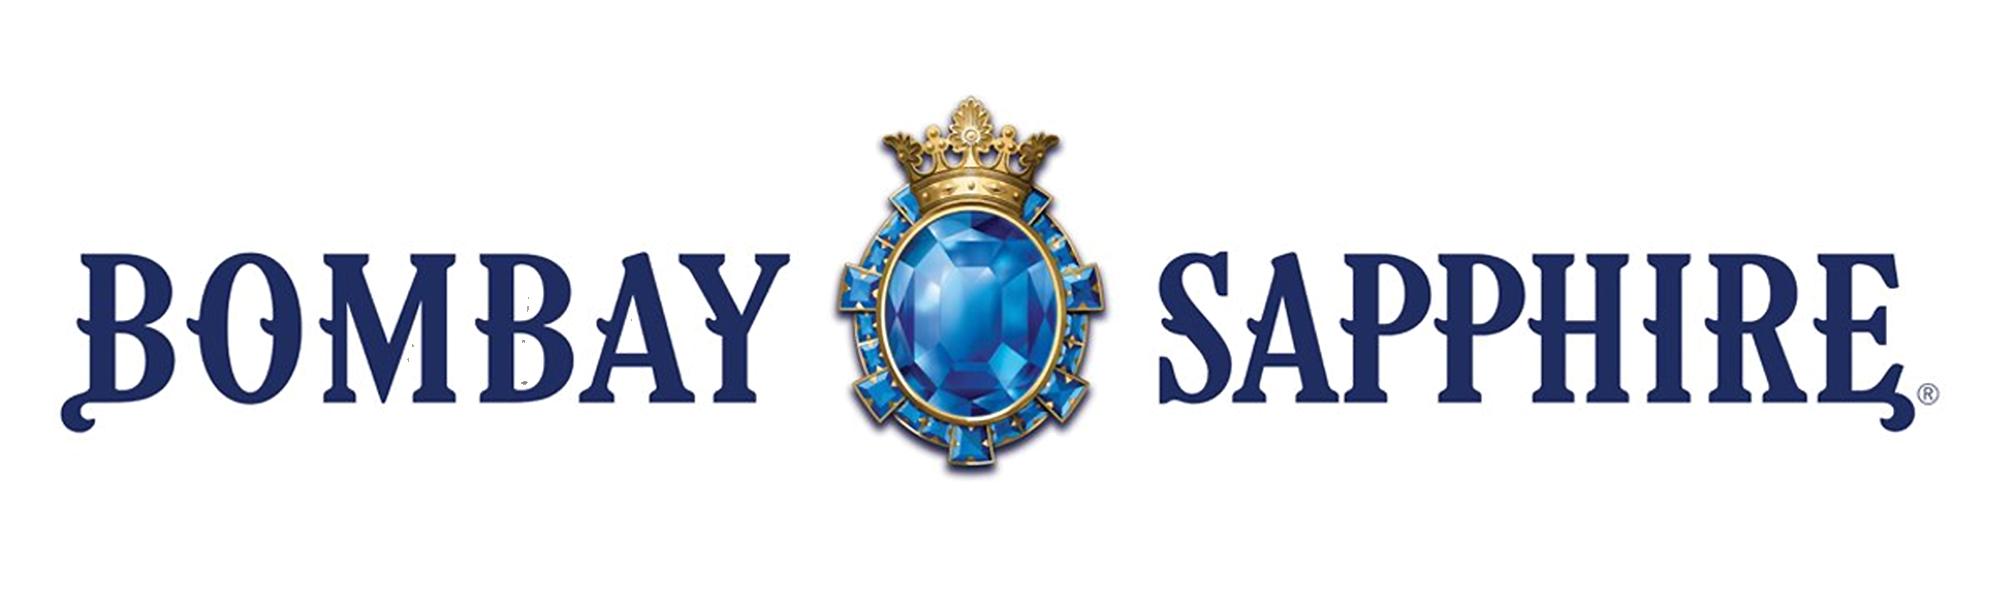 Bombay Sapphire Logo, image, download logo | LogoWiki.net